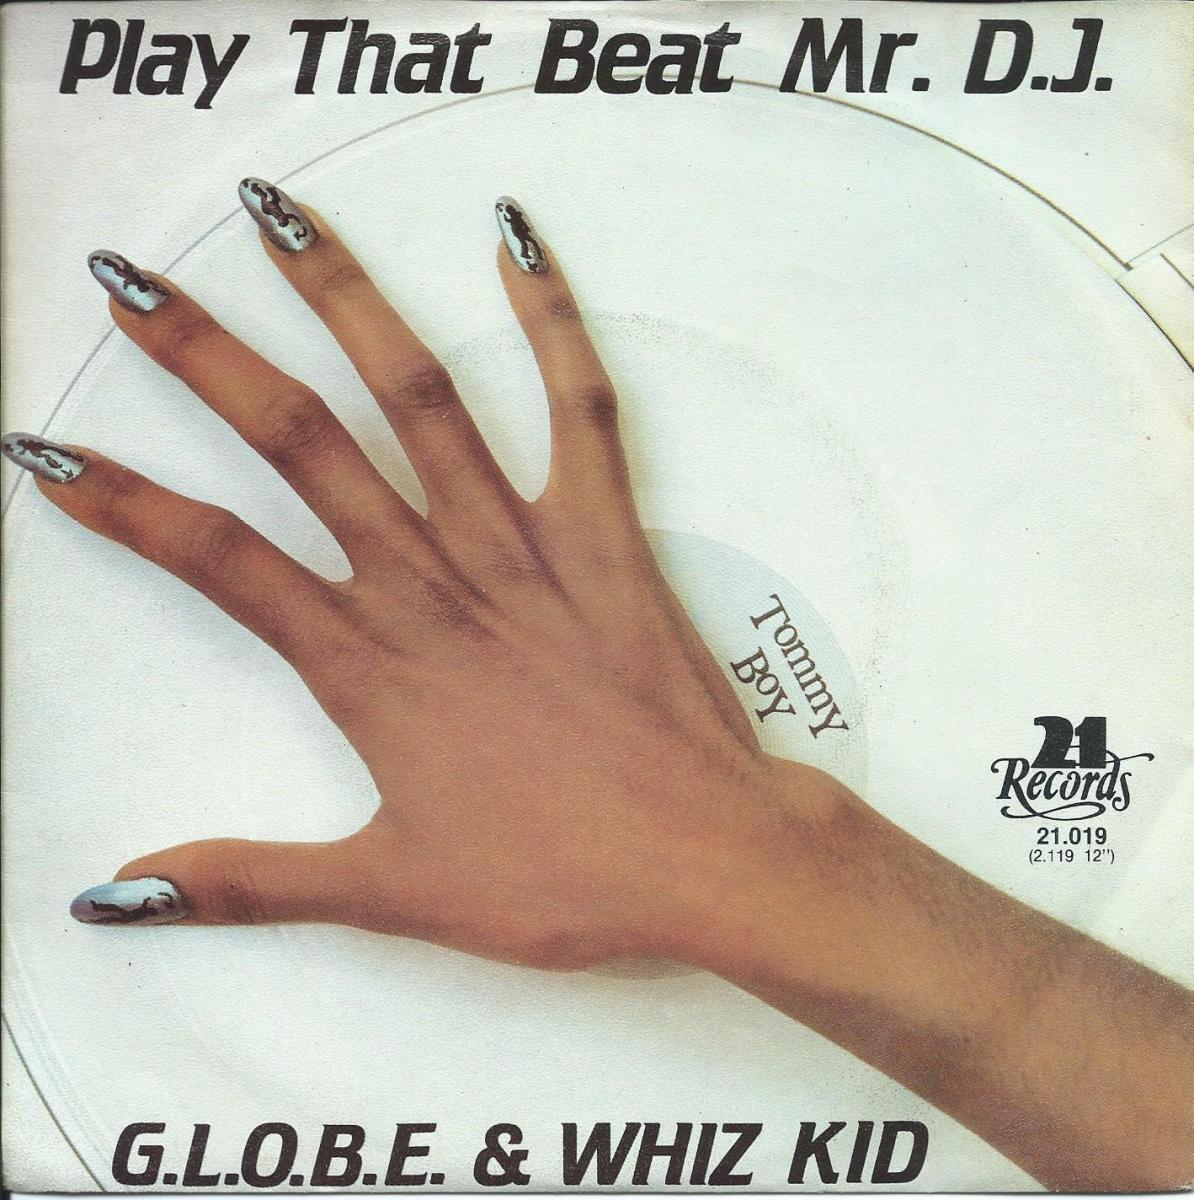 G.L.O.B.E. & WHIZ KID / PLAY THAT BEAT MR. D.J. (7